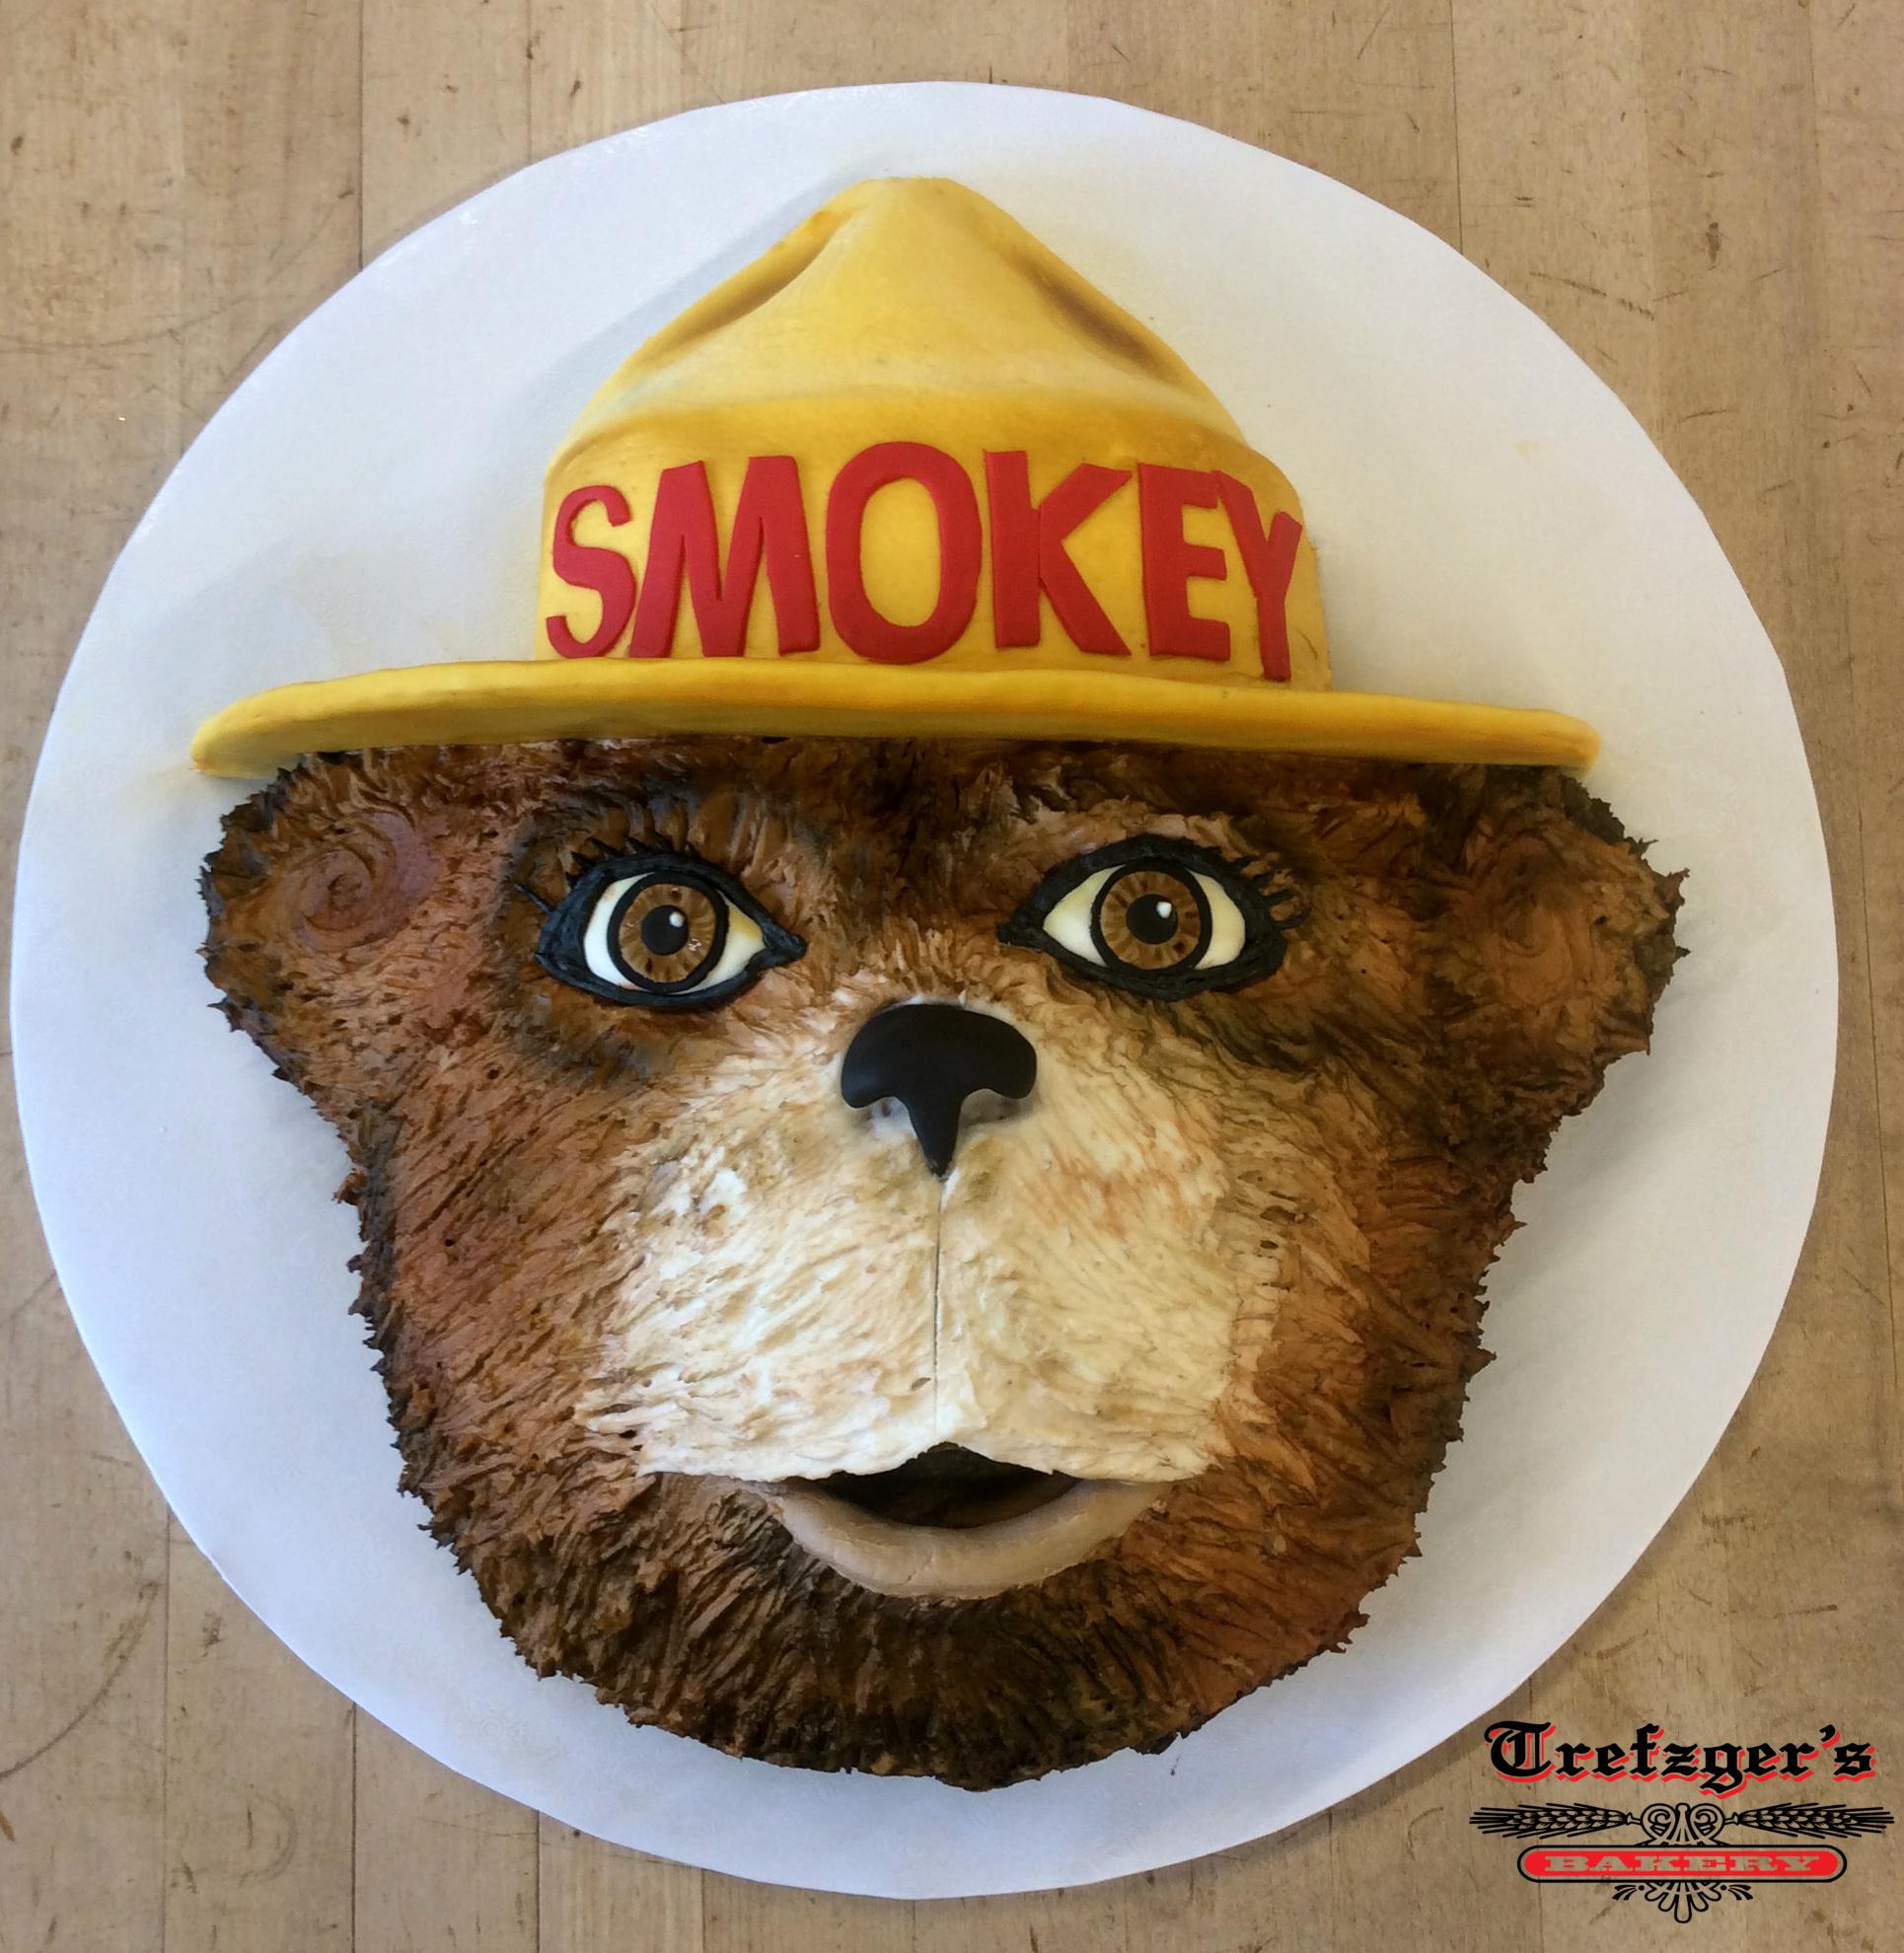 Smokey the Bear Shaped Cake